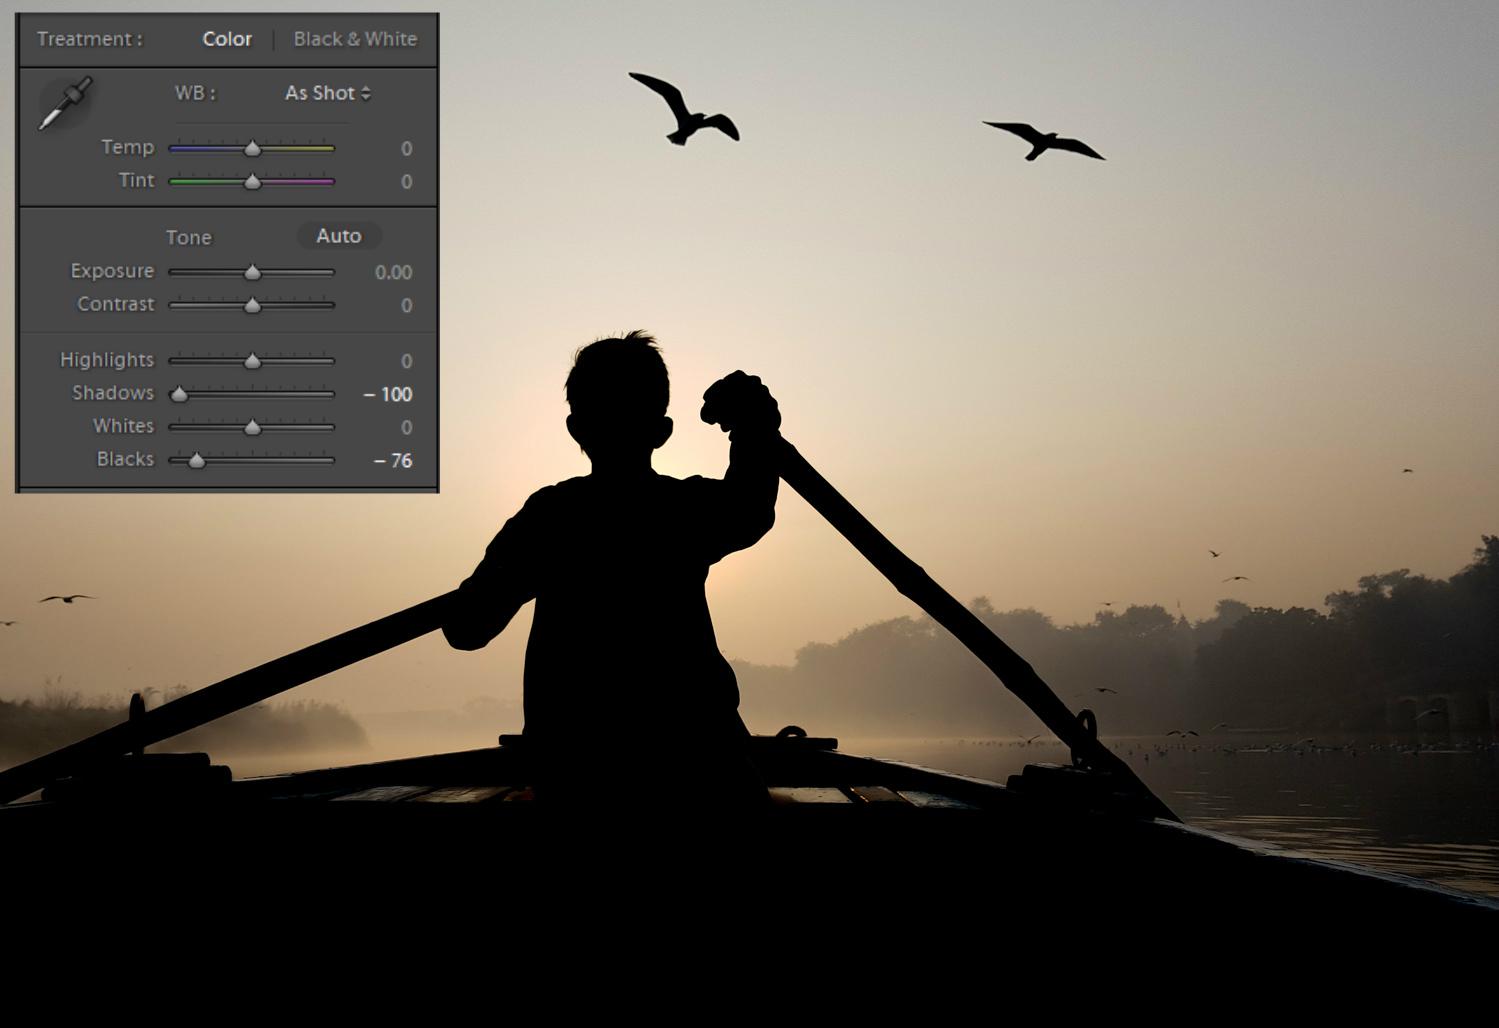 https://i1.wp.com/digital-photography-school.com/wp-content/uploads/2019/02/silhouette-photo-editing-lightroom-2.jpg?resize=1499%2C1028&ssl=1